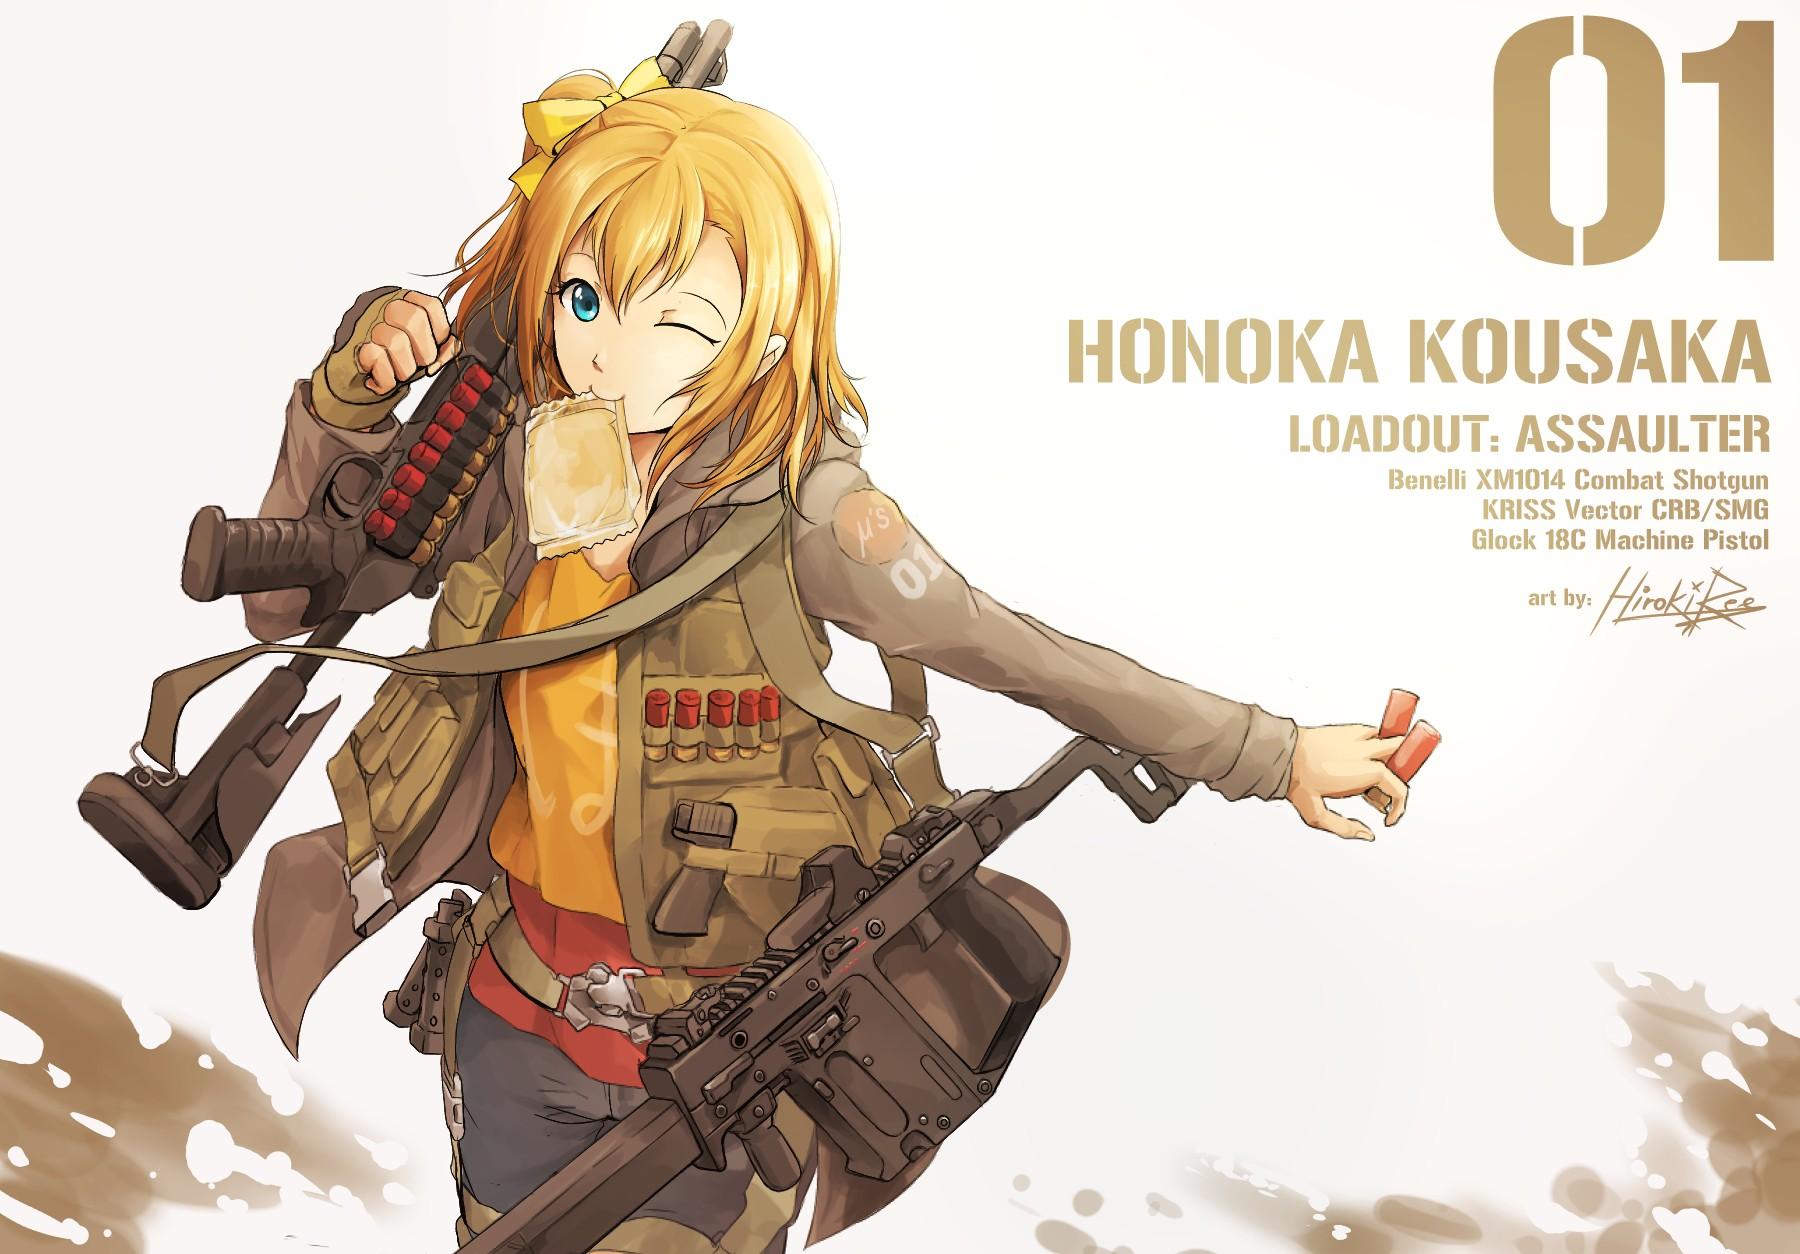 Anime 1800x1254 anime anime girls Love Live! gun weapon Kousaka Honoka short hair yellow hair blue eyes anime girls eating